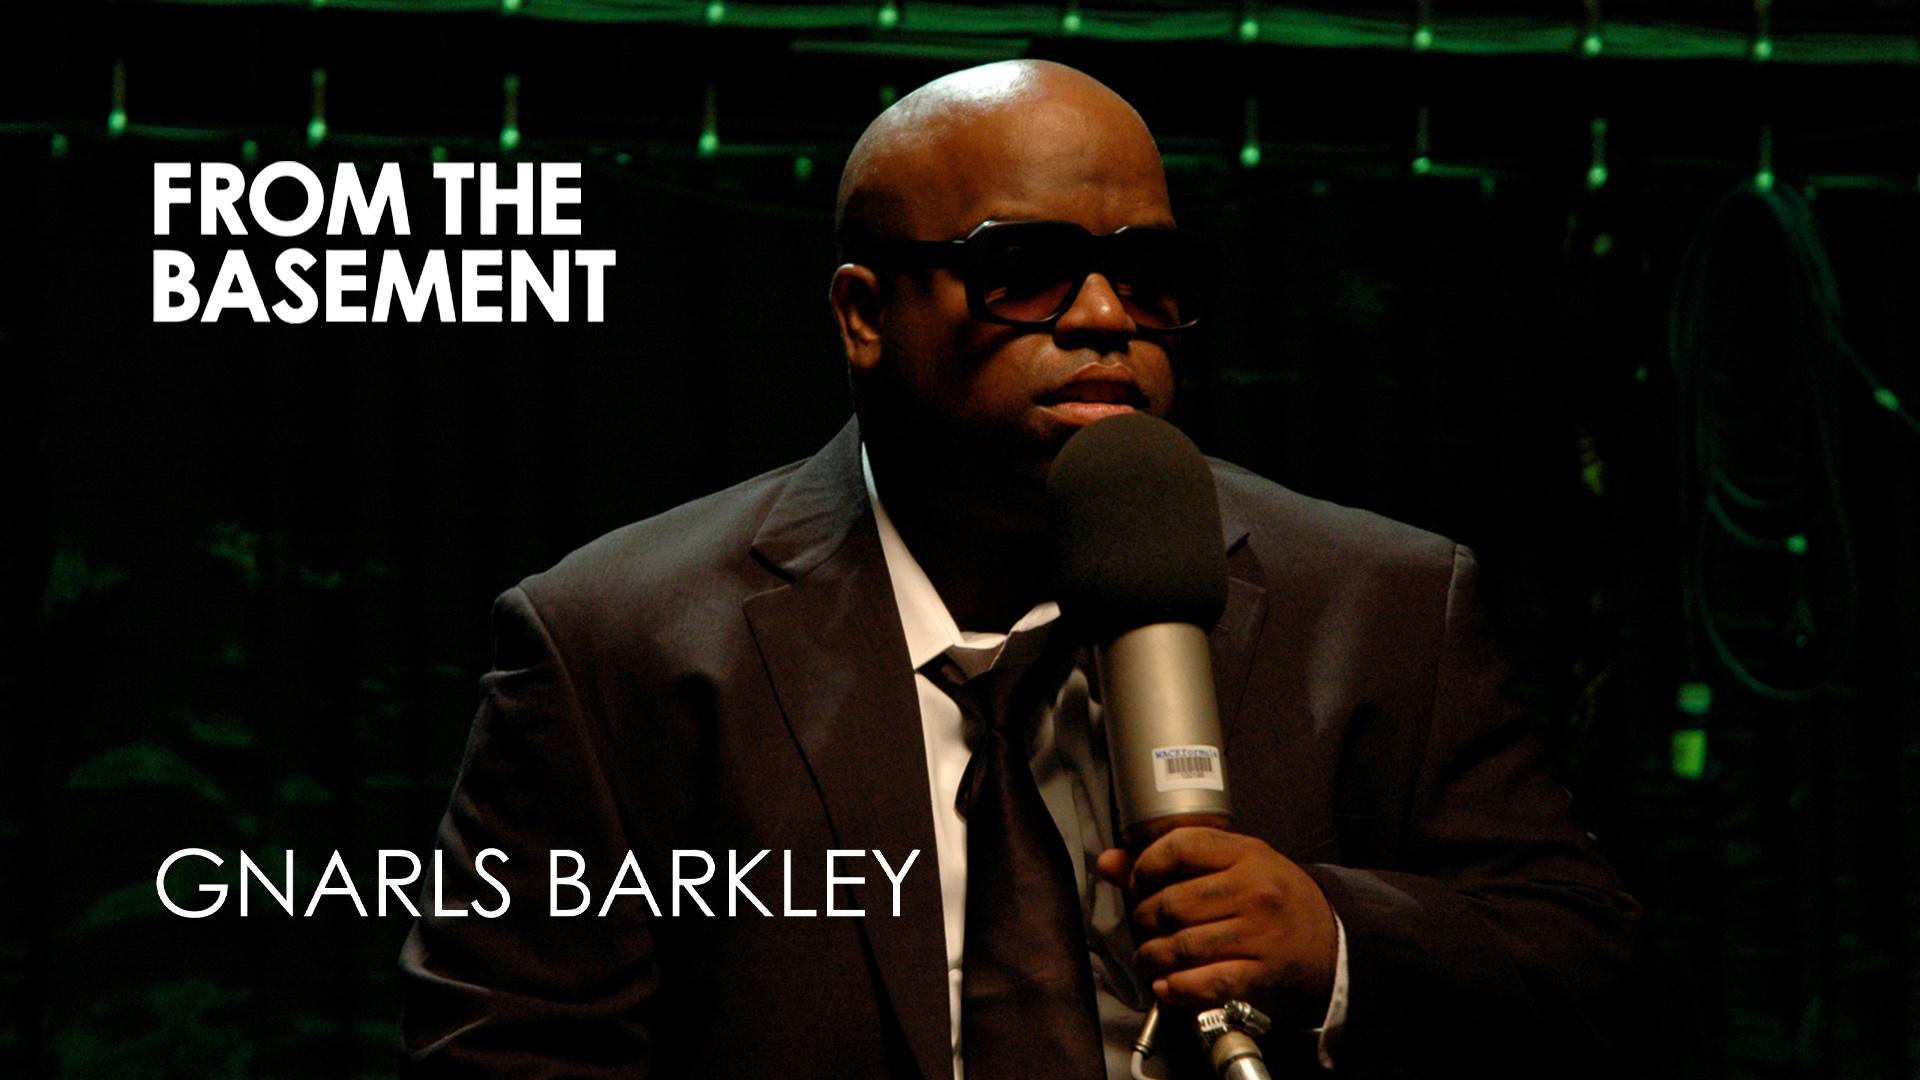 Gnarls Barkley - From the Basement